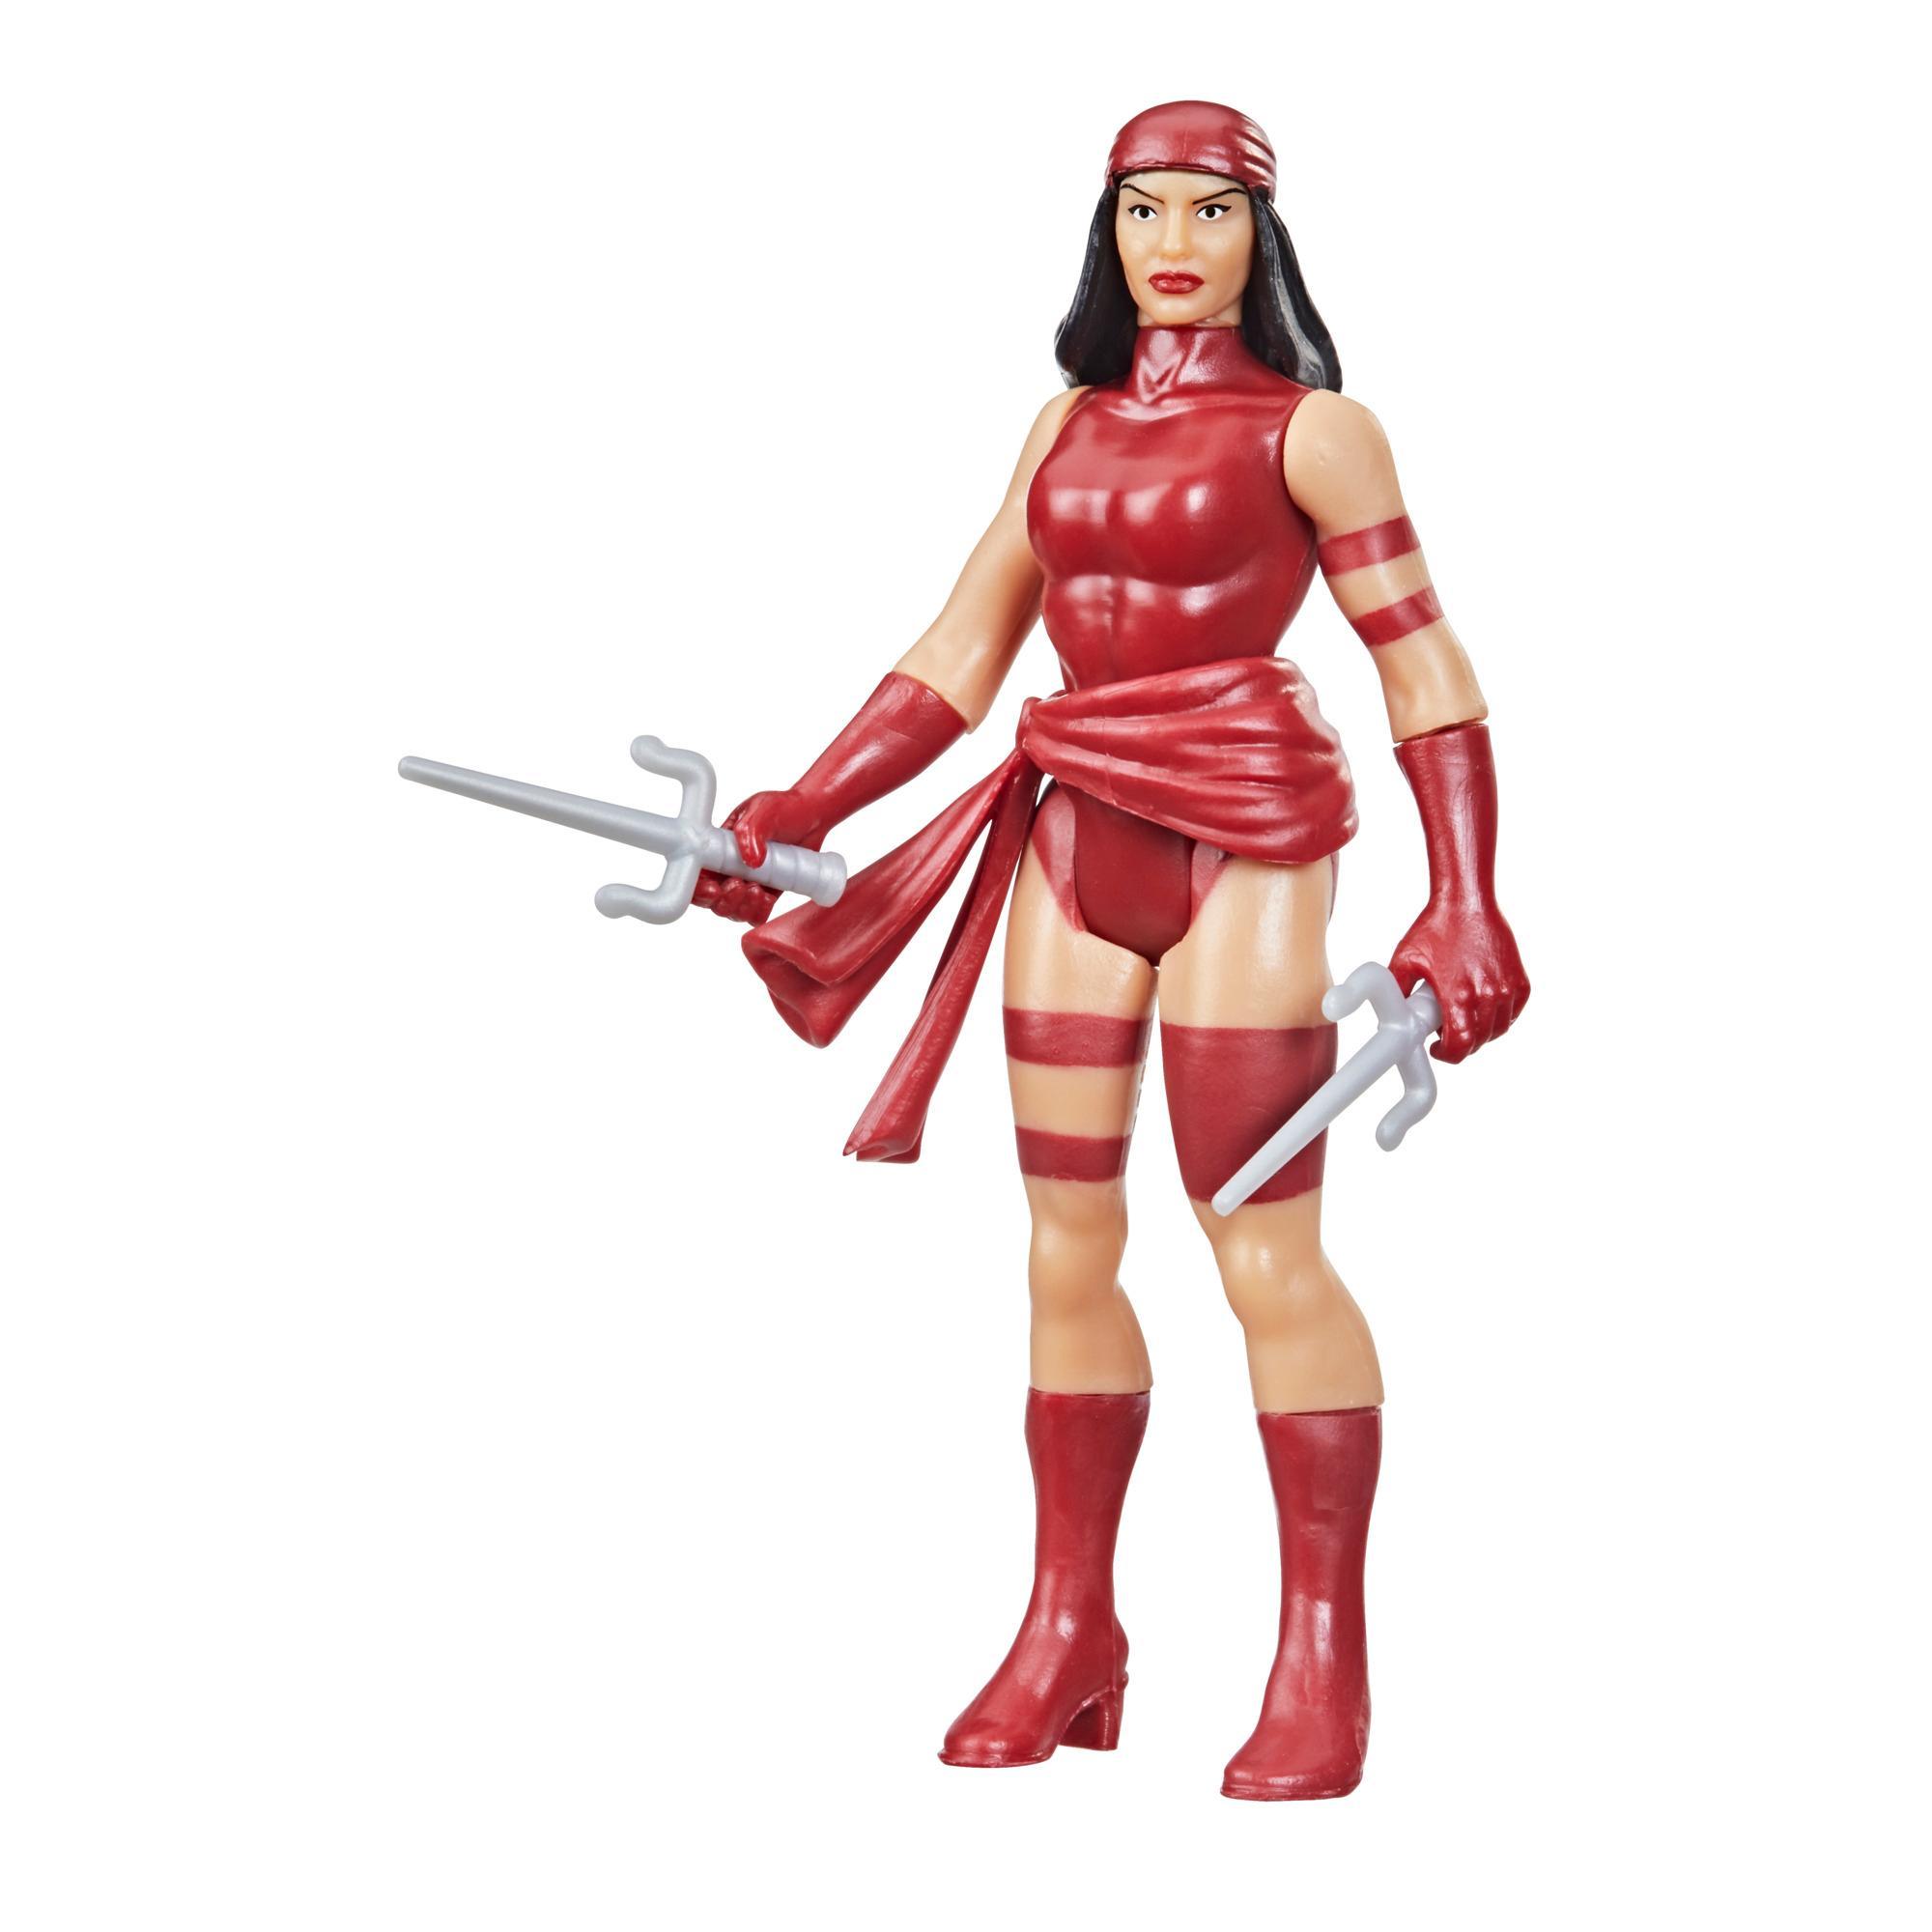 Hasbro Marvel Legends Retro 375 Collection Elektra Figura Brinquedo 9,5 cm